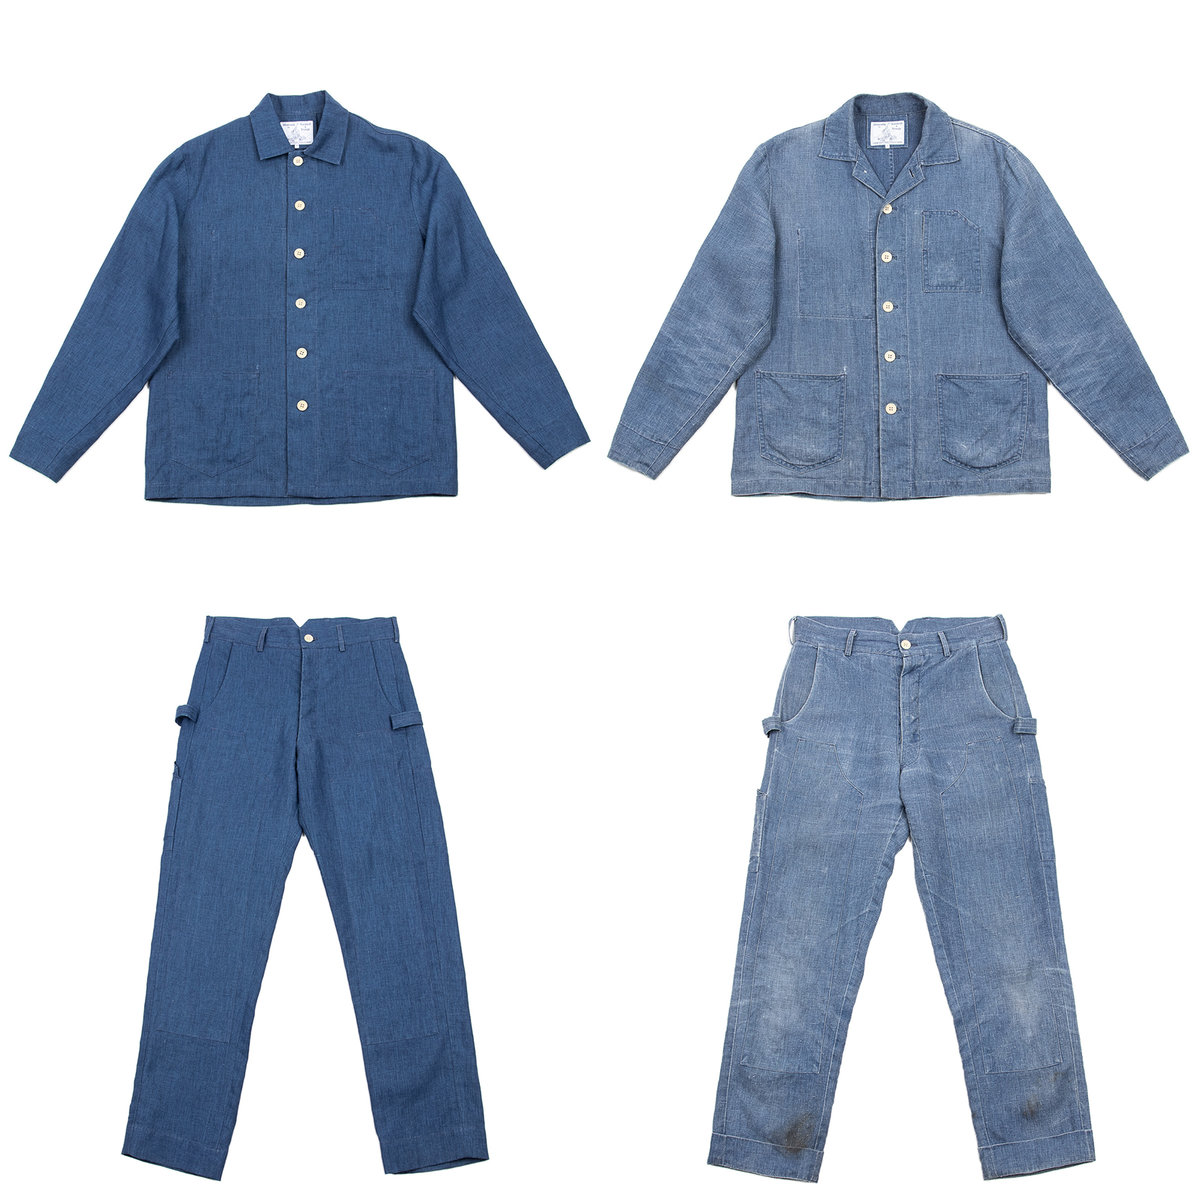 Blluemade - Garden Suit - New vs Elliot.jpg